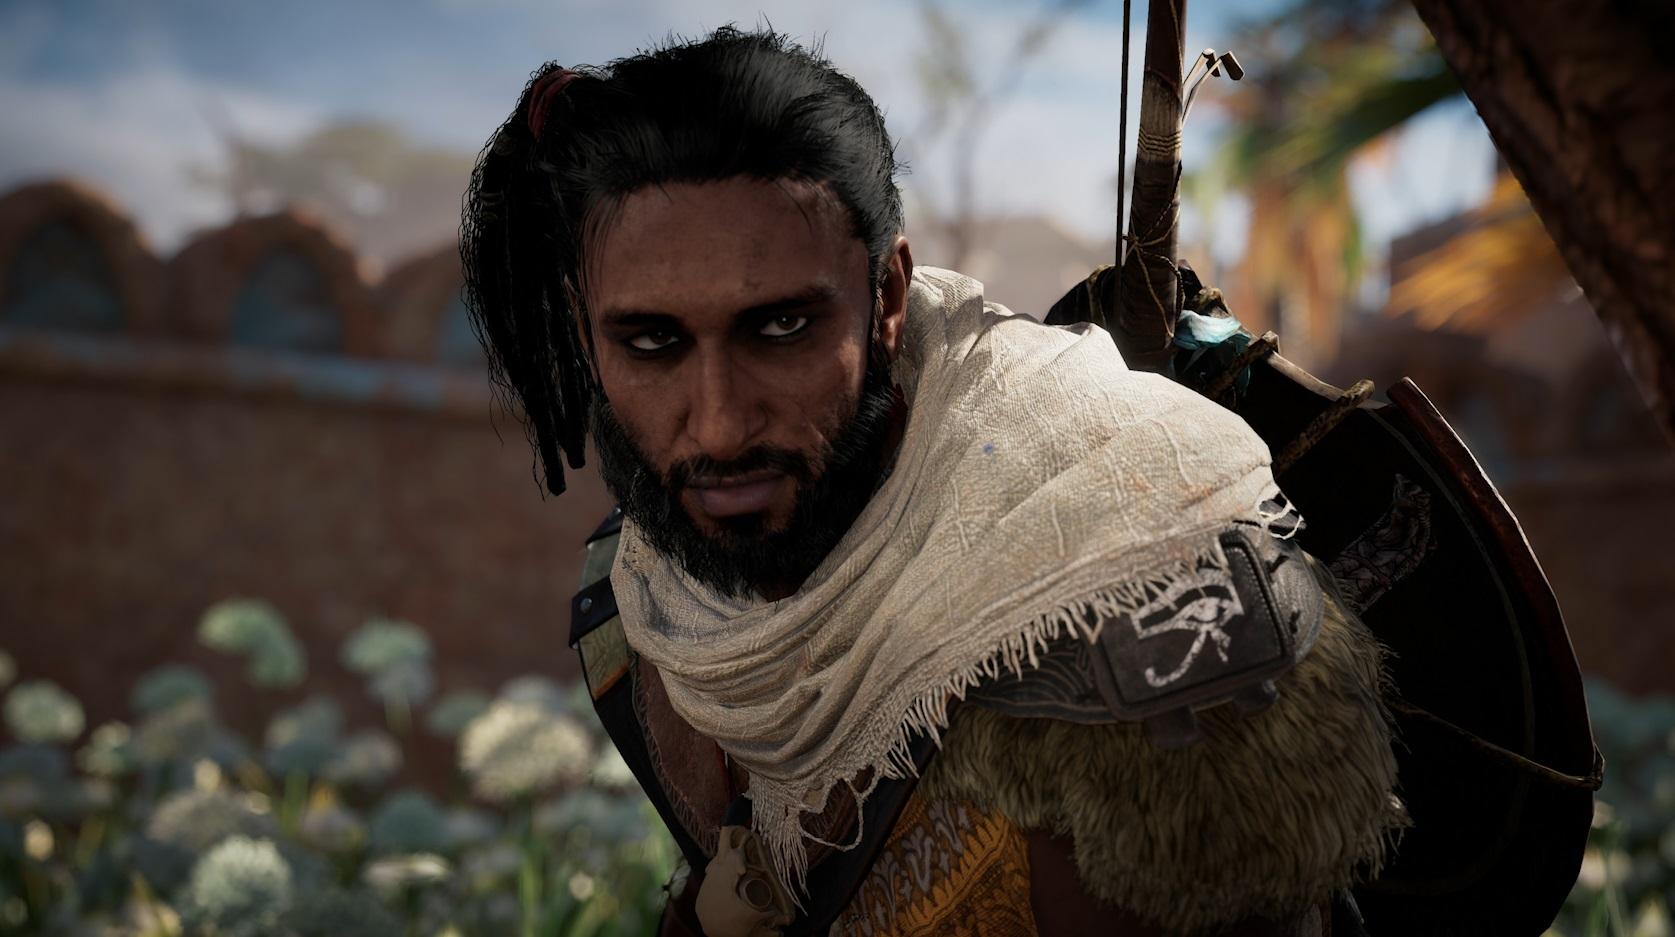 Assassin's Creed Odyssey welcomes Bayek from AC Origins screenshot